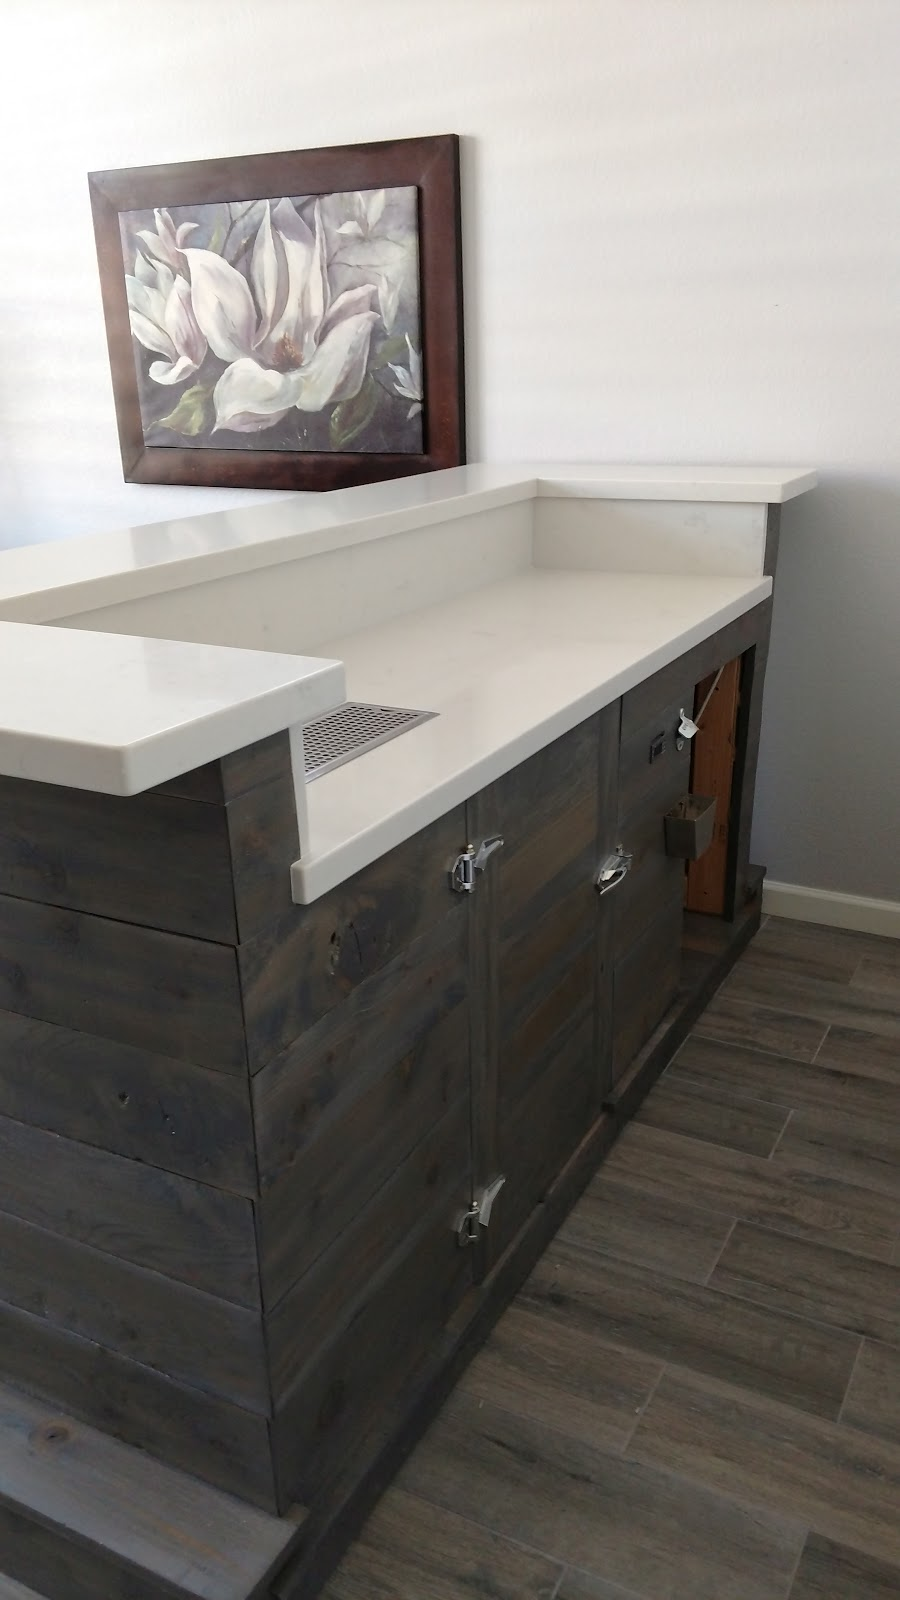 L & M Granite Countertops - home goods store  | Photo 4 of 10 | Address: 2723 W Cheery Lynn Rd, Phoenix, AZ 85017, USA | Phone: (623) 255-3952